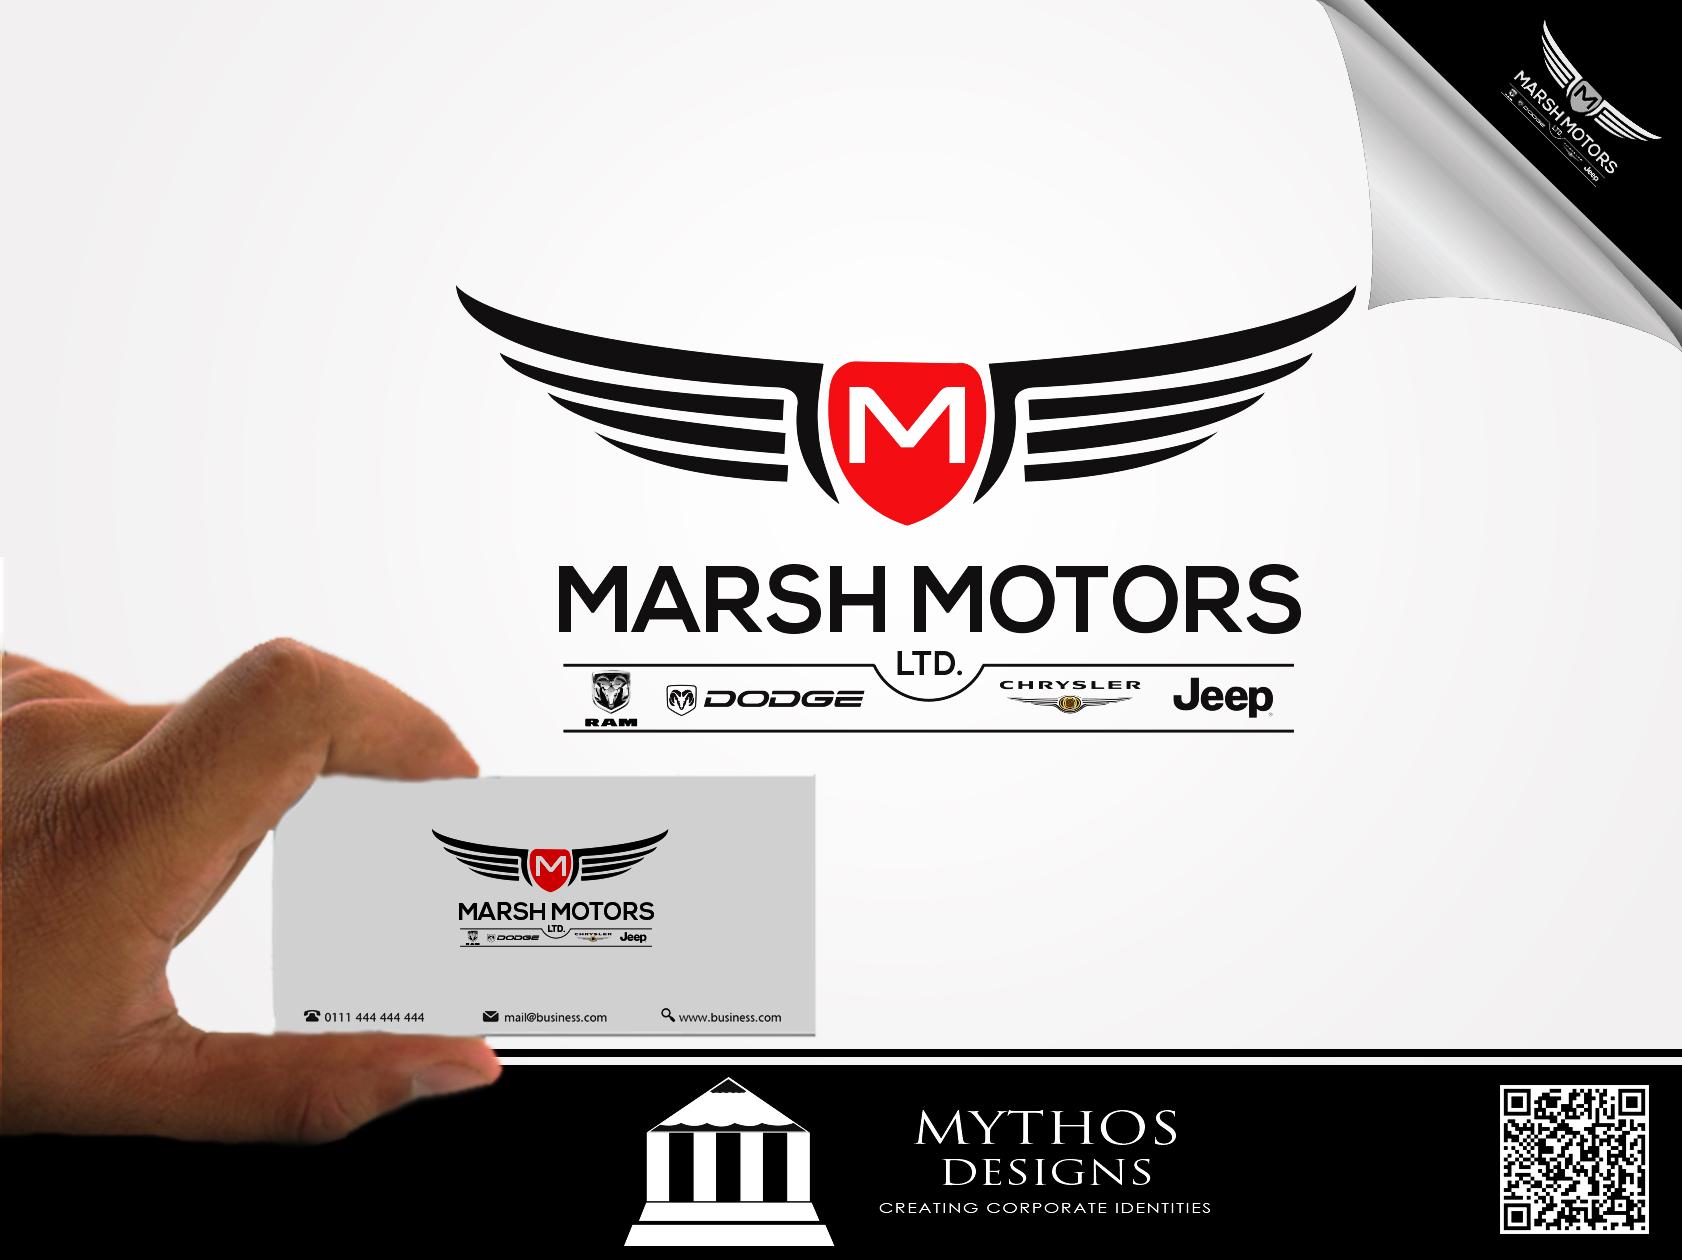 Logo Design by Mythos Designs - Entry No. 37 in the Logo Design Contest Marsh Motors Chrysler Logo Design.